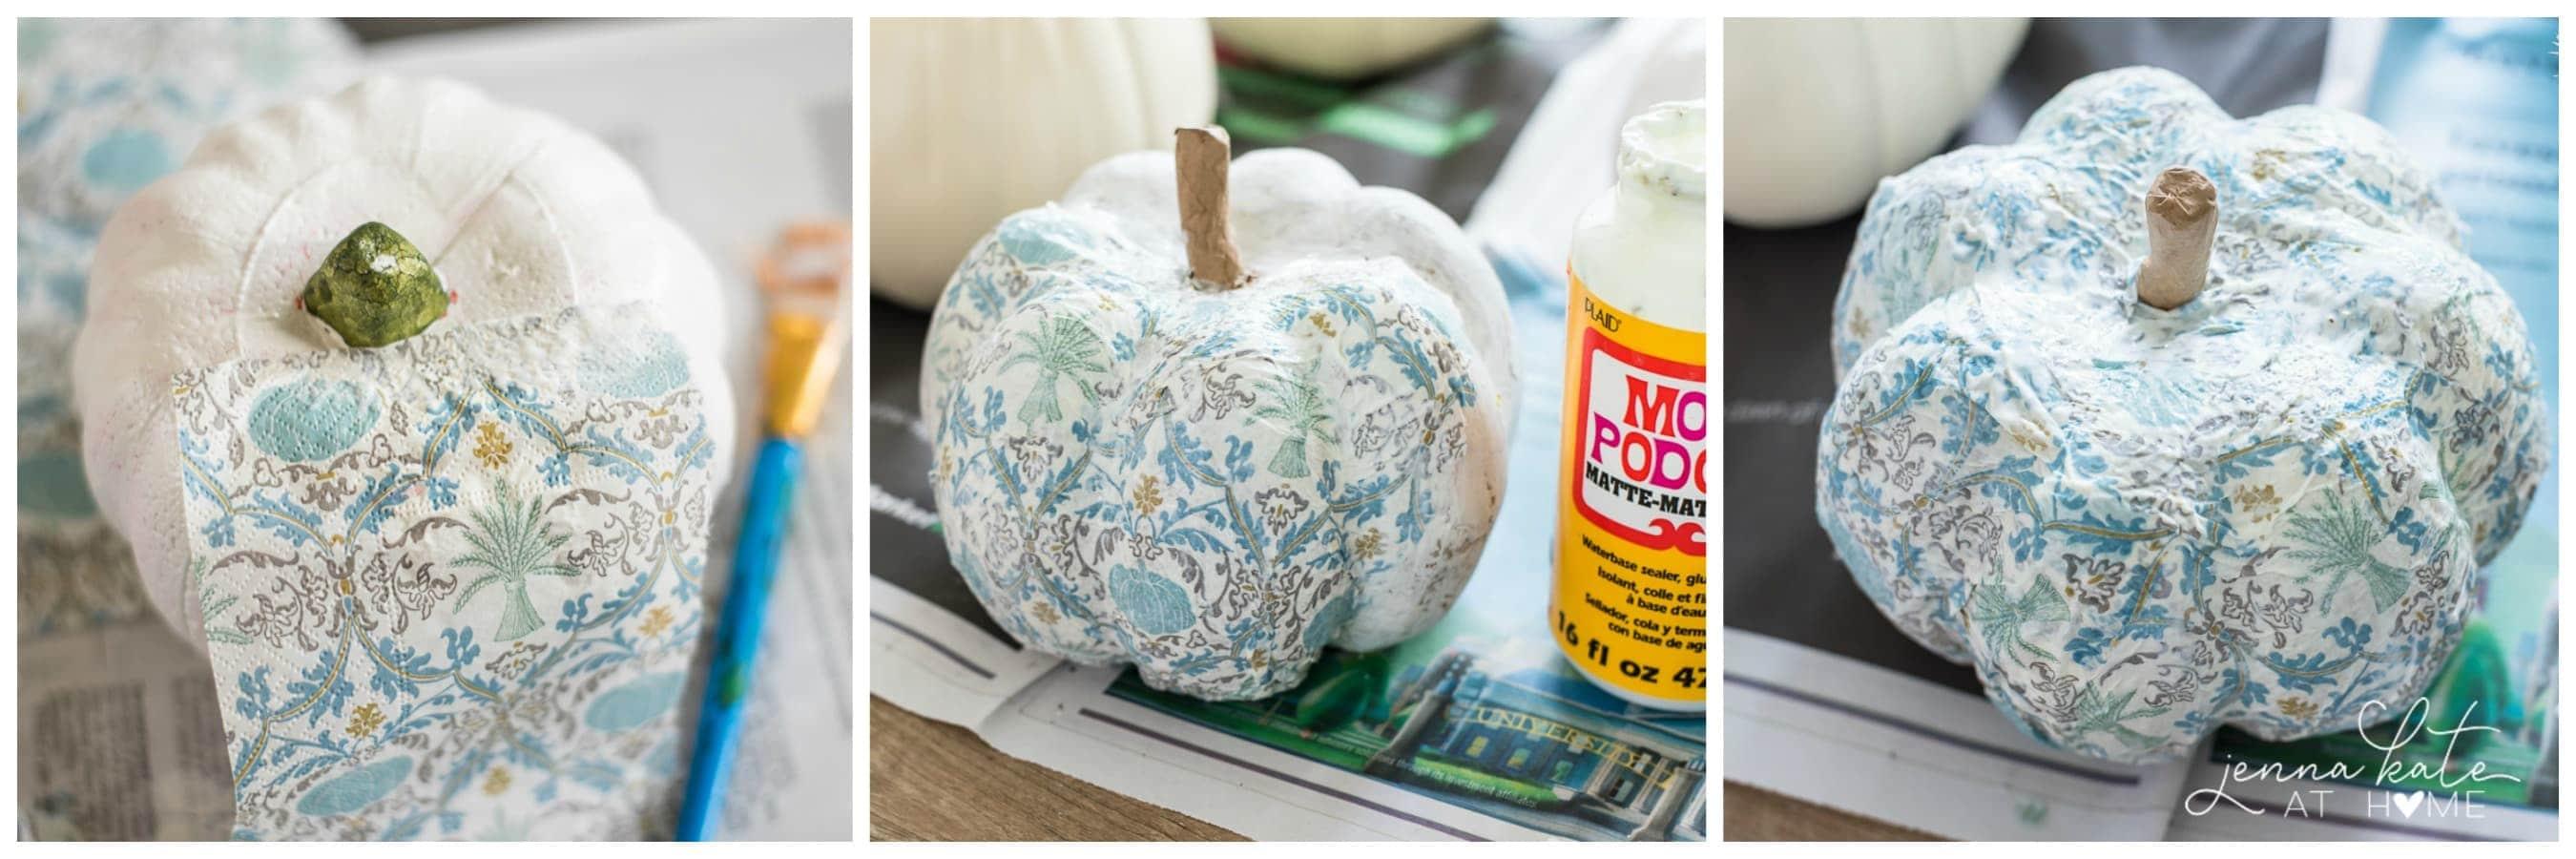 A fun and creative fall pumpkin decorating idea